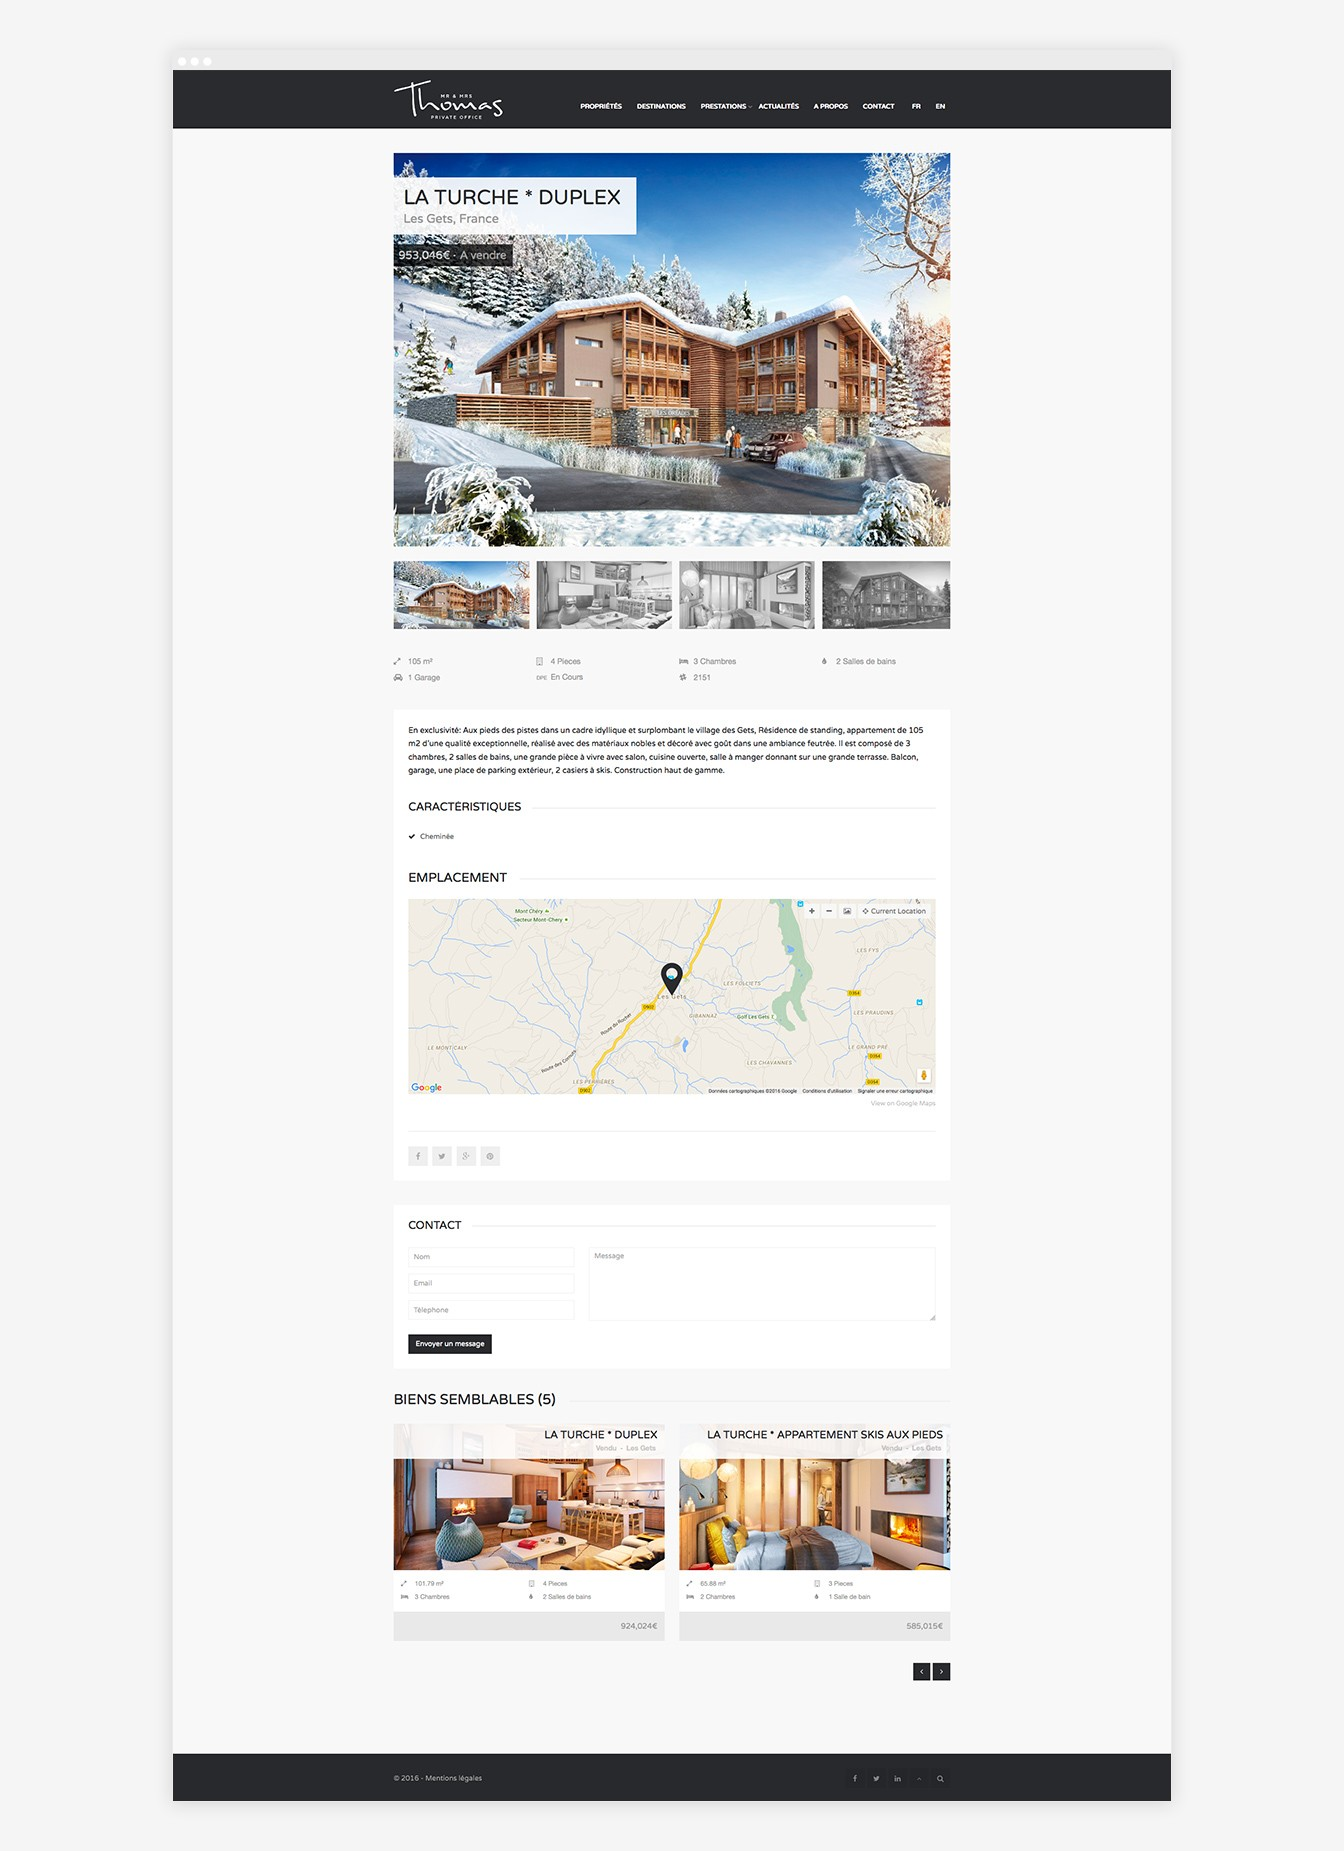 02-mr-and-mrs-thomas-web-pikteo-webdesign-graphic-design-freelance-paris-bruxelles-lyon